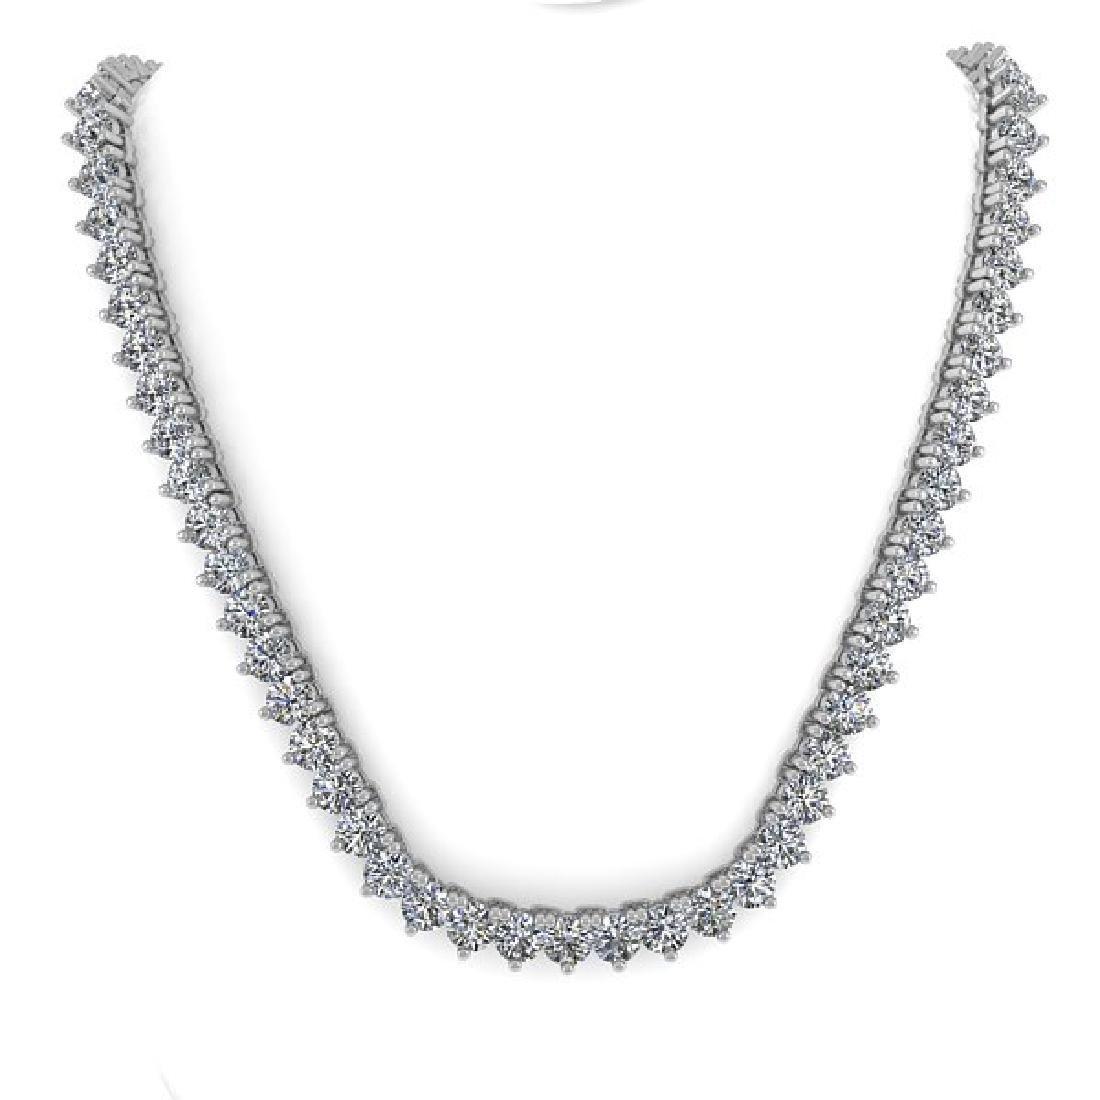 45 CTW Solitaire SI Diamond Necklace 14K White Gold - 3